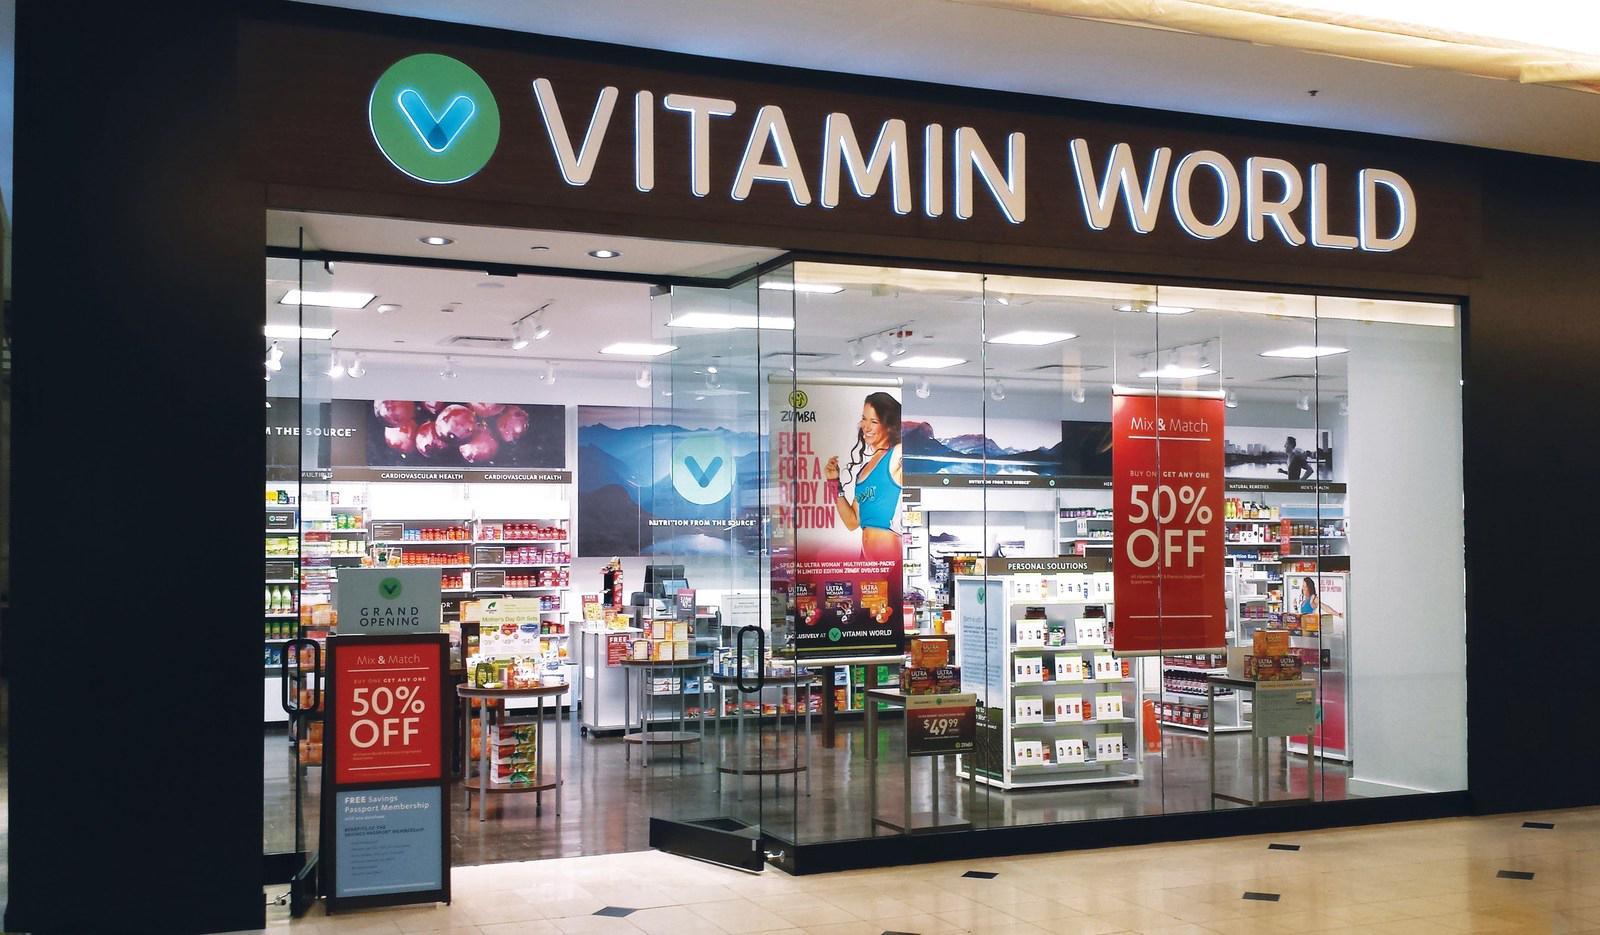 Vitamin retail stores